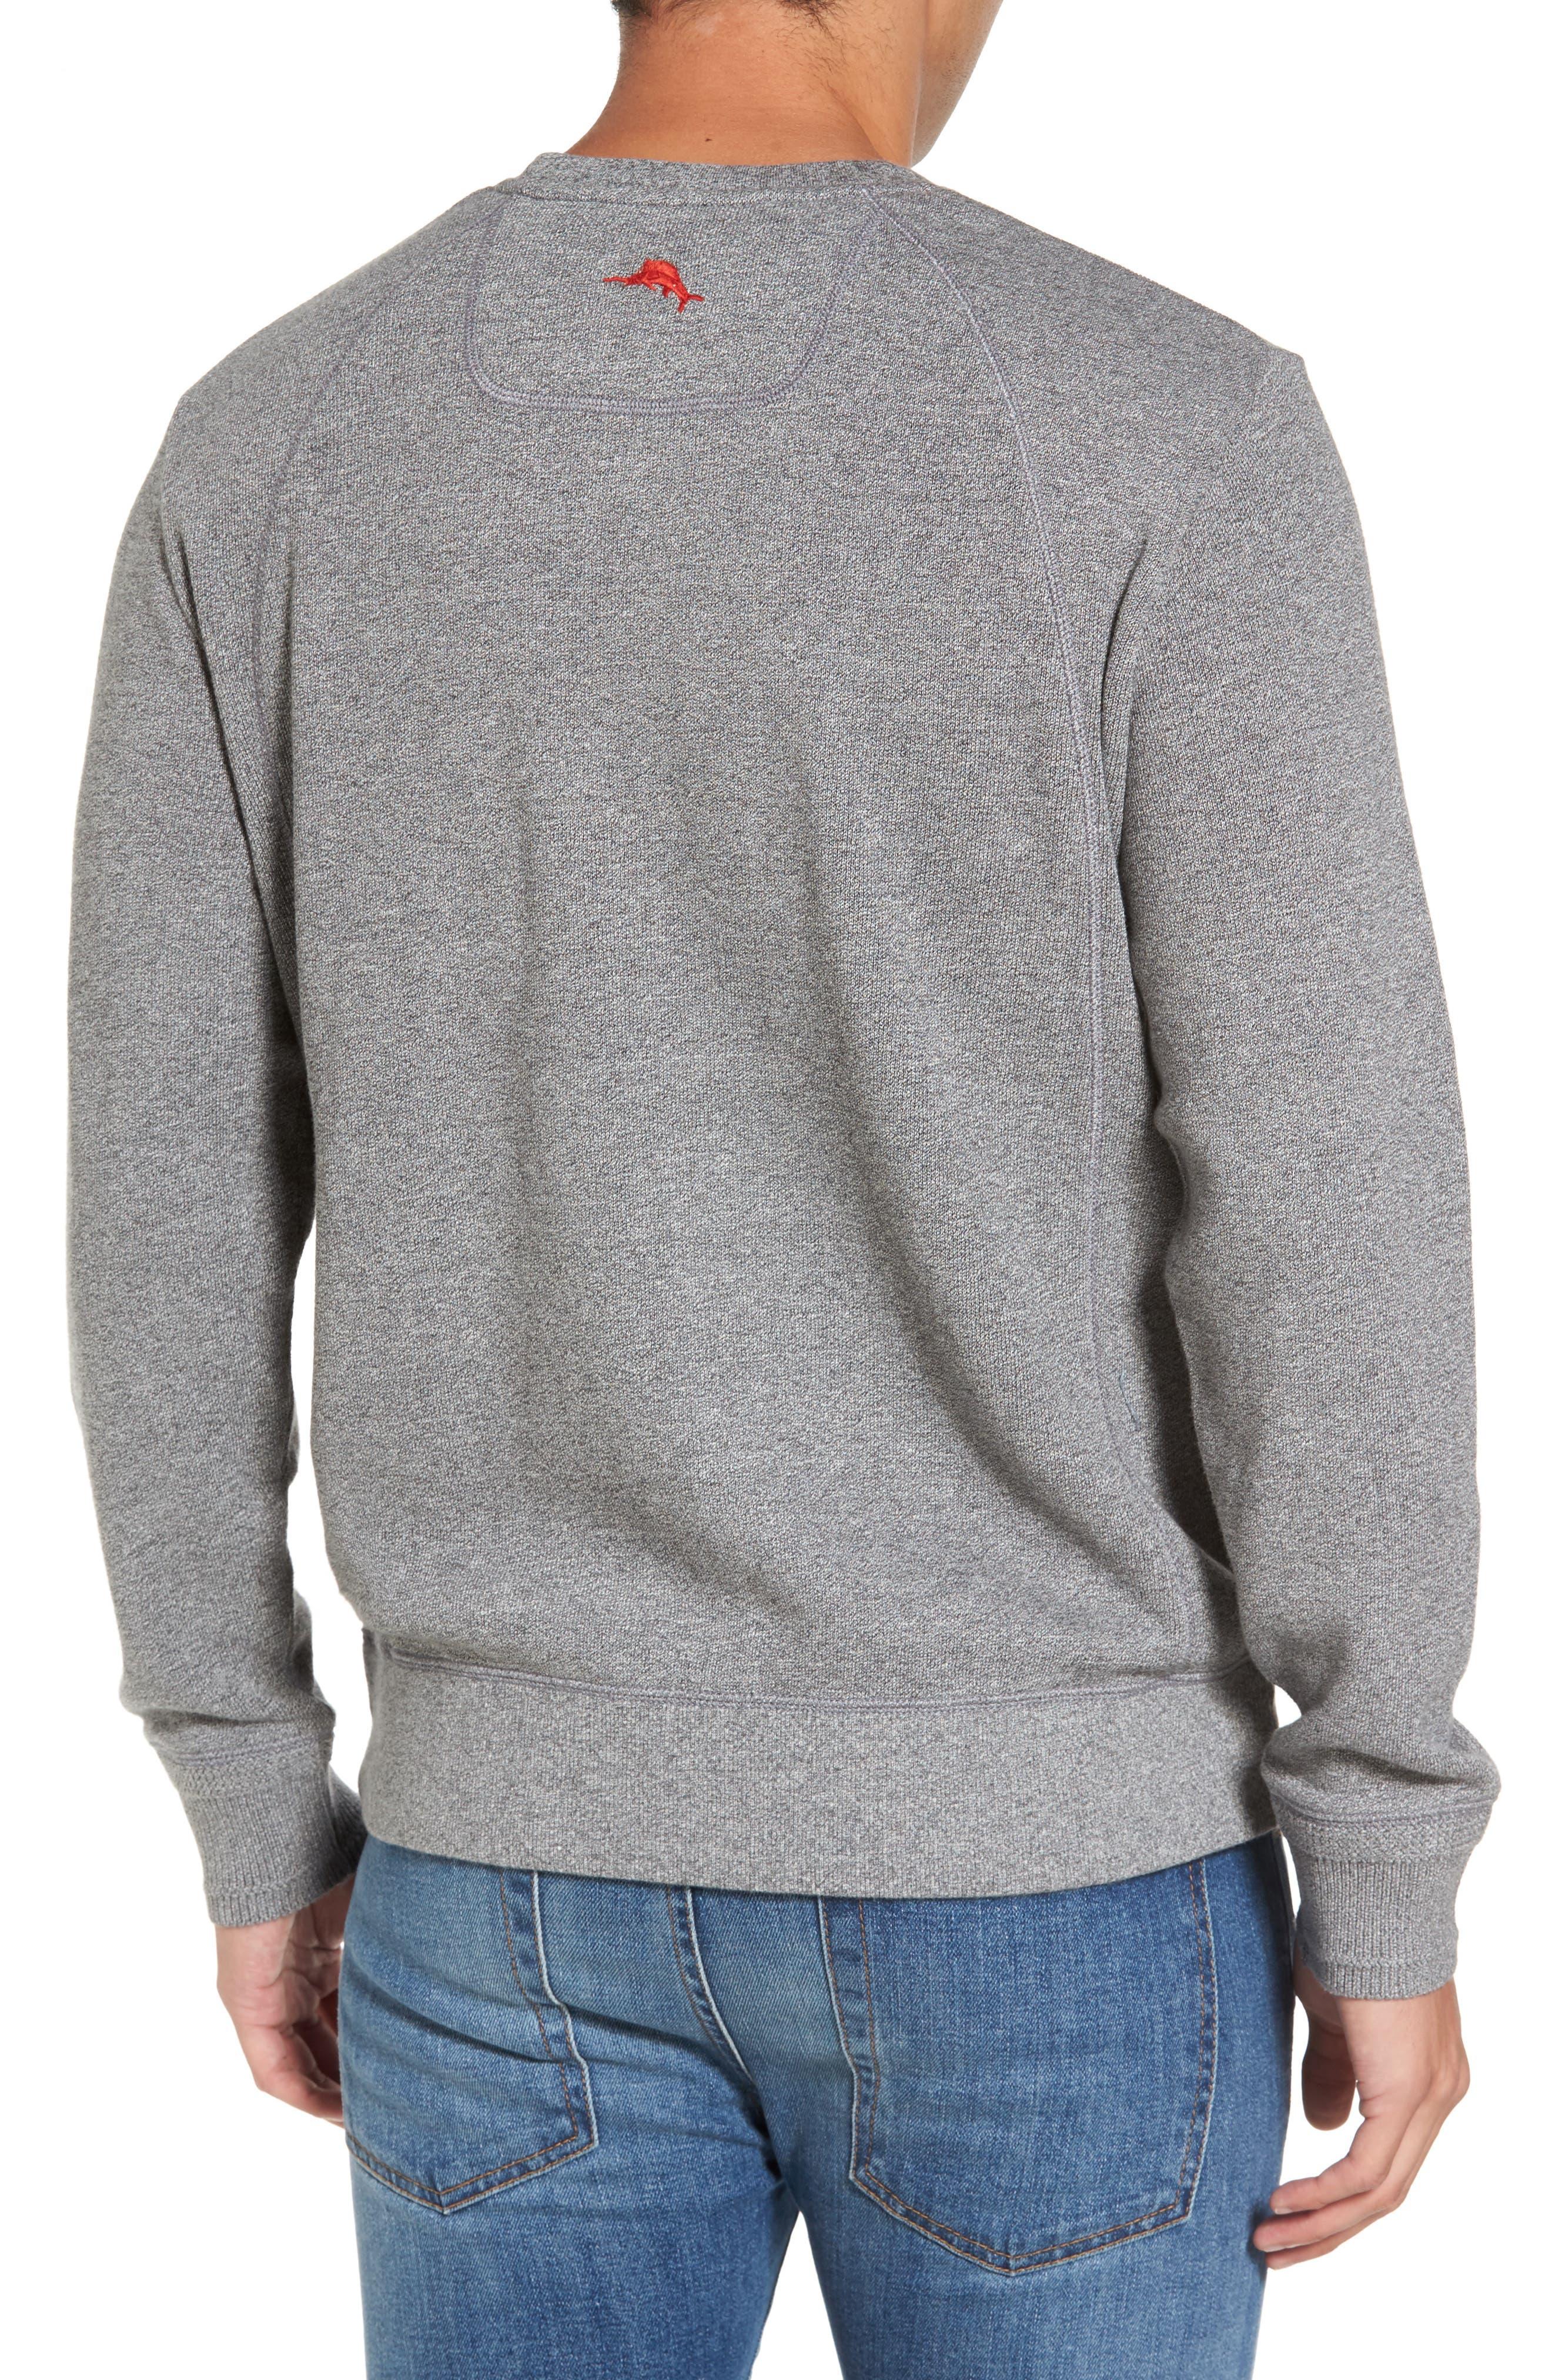 NFL Stitch of Liberty Embroidered Crewneck Sweatshirt,                             Alternate thumbnail 37, color,